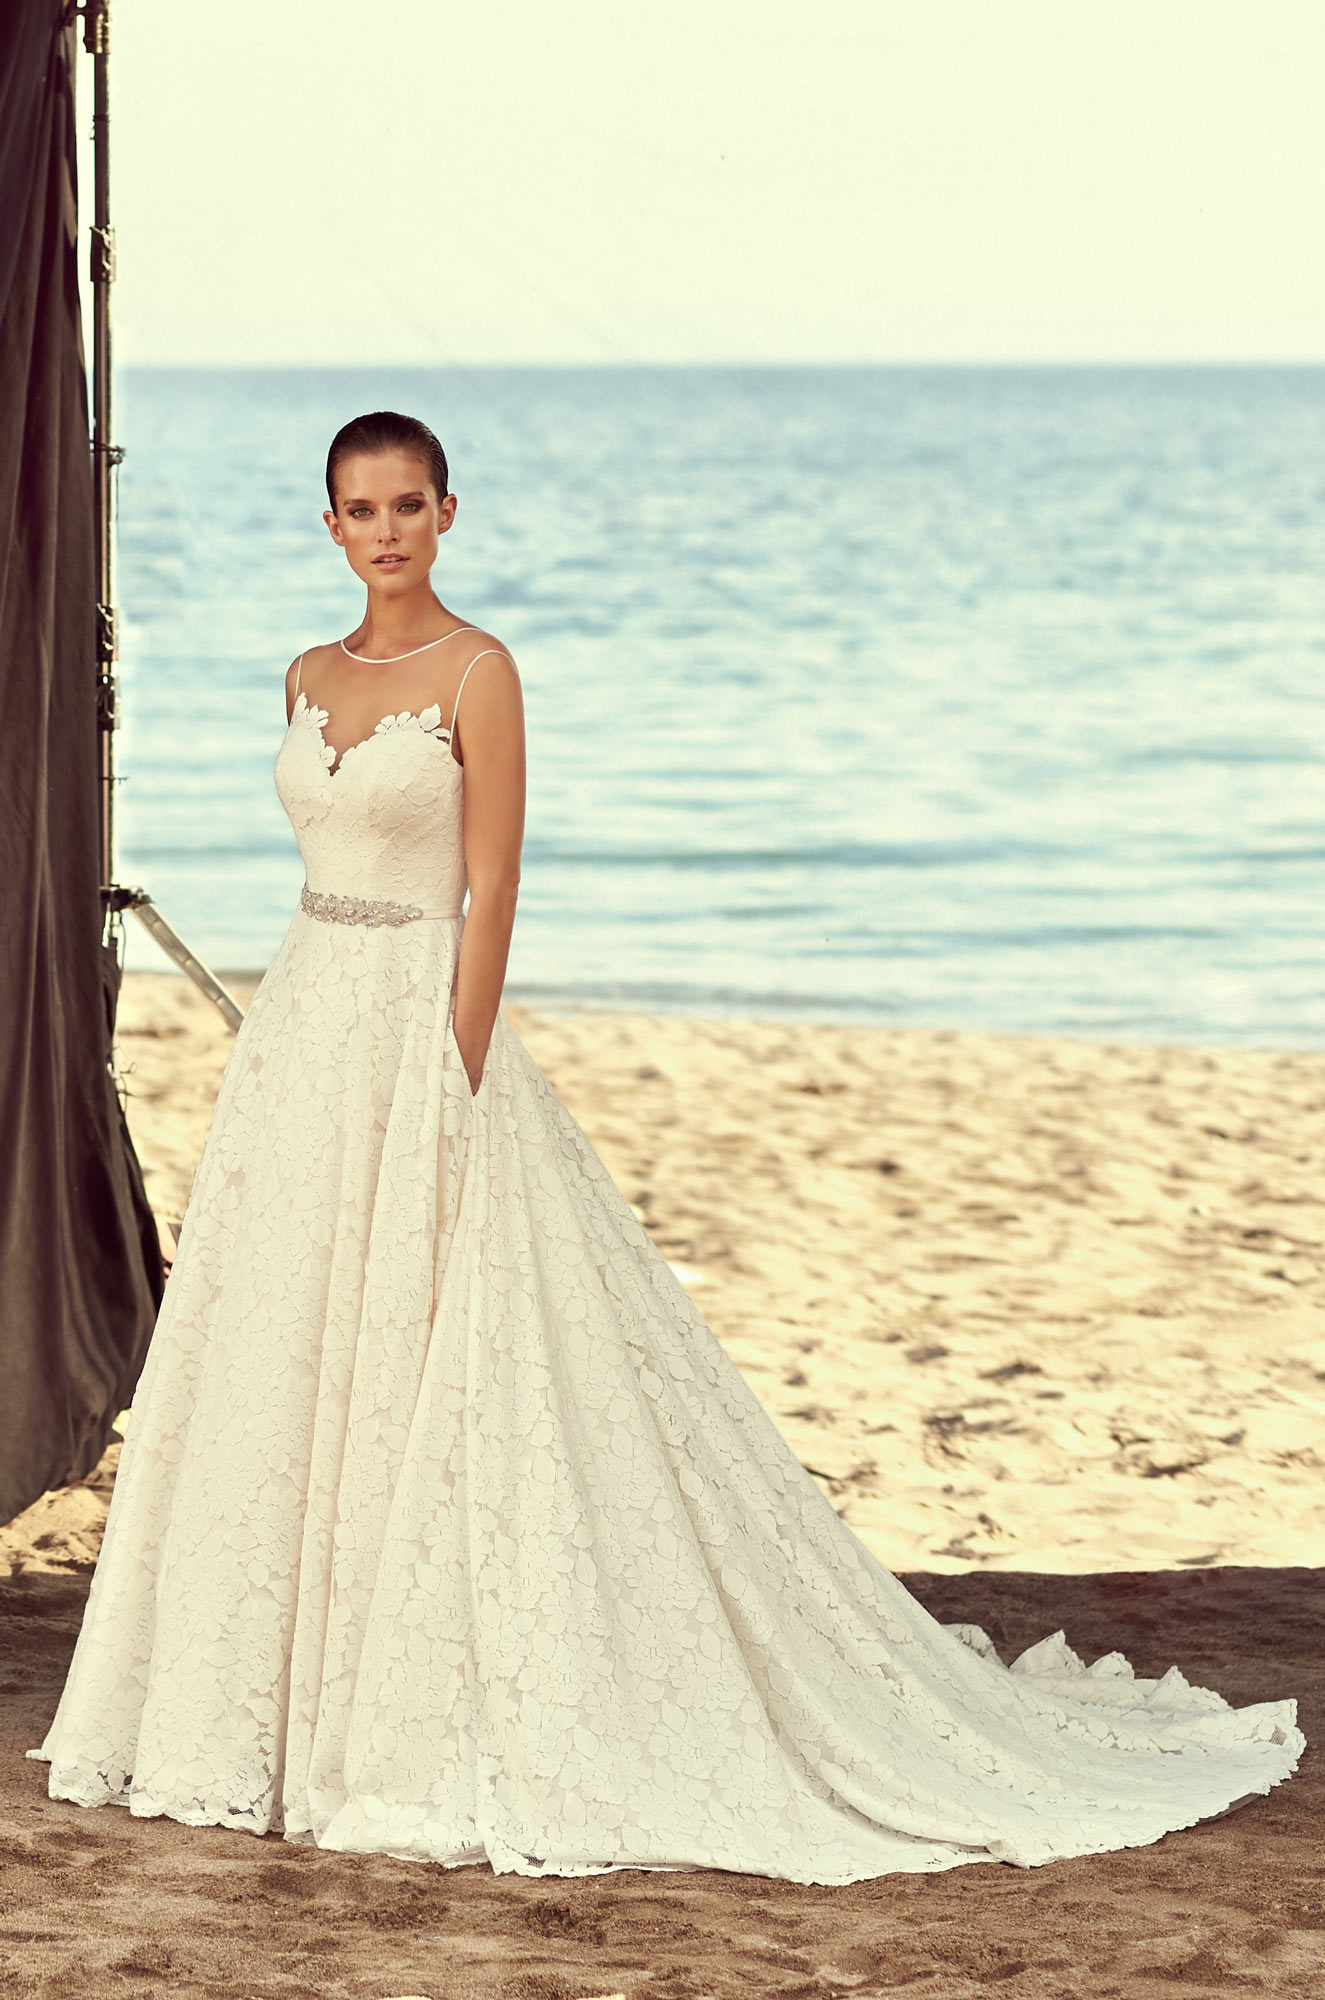 Full Lace Skirt Wedding Dress - Style #2188 | Mikaella Bridal